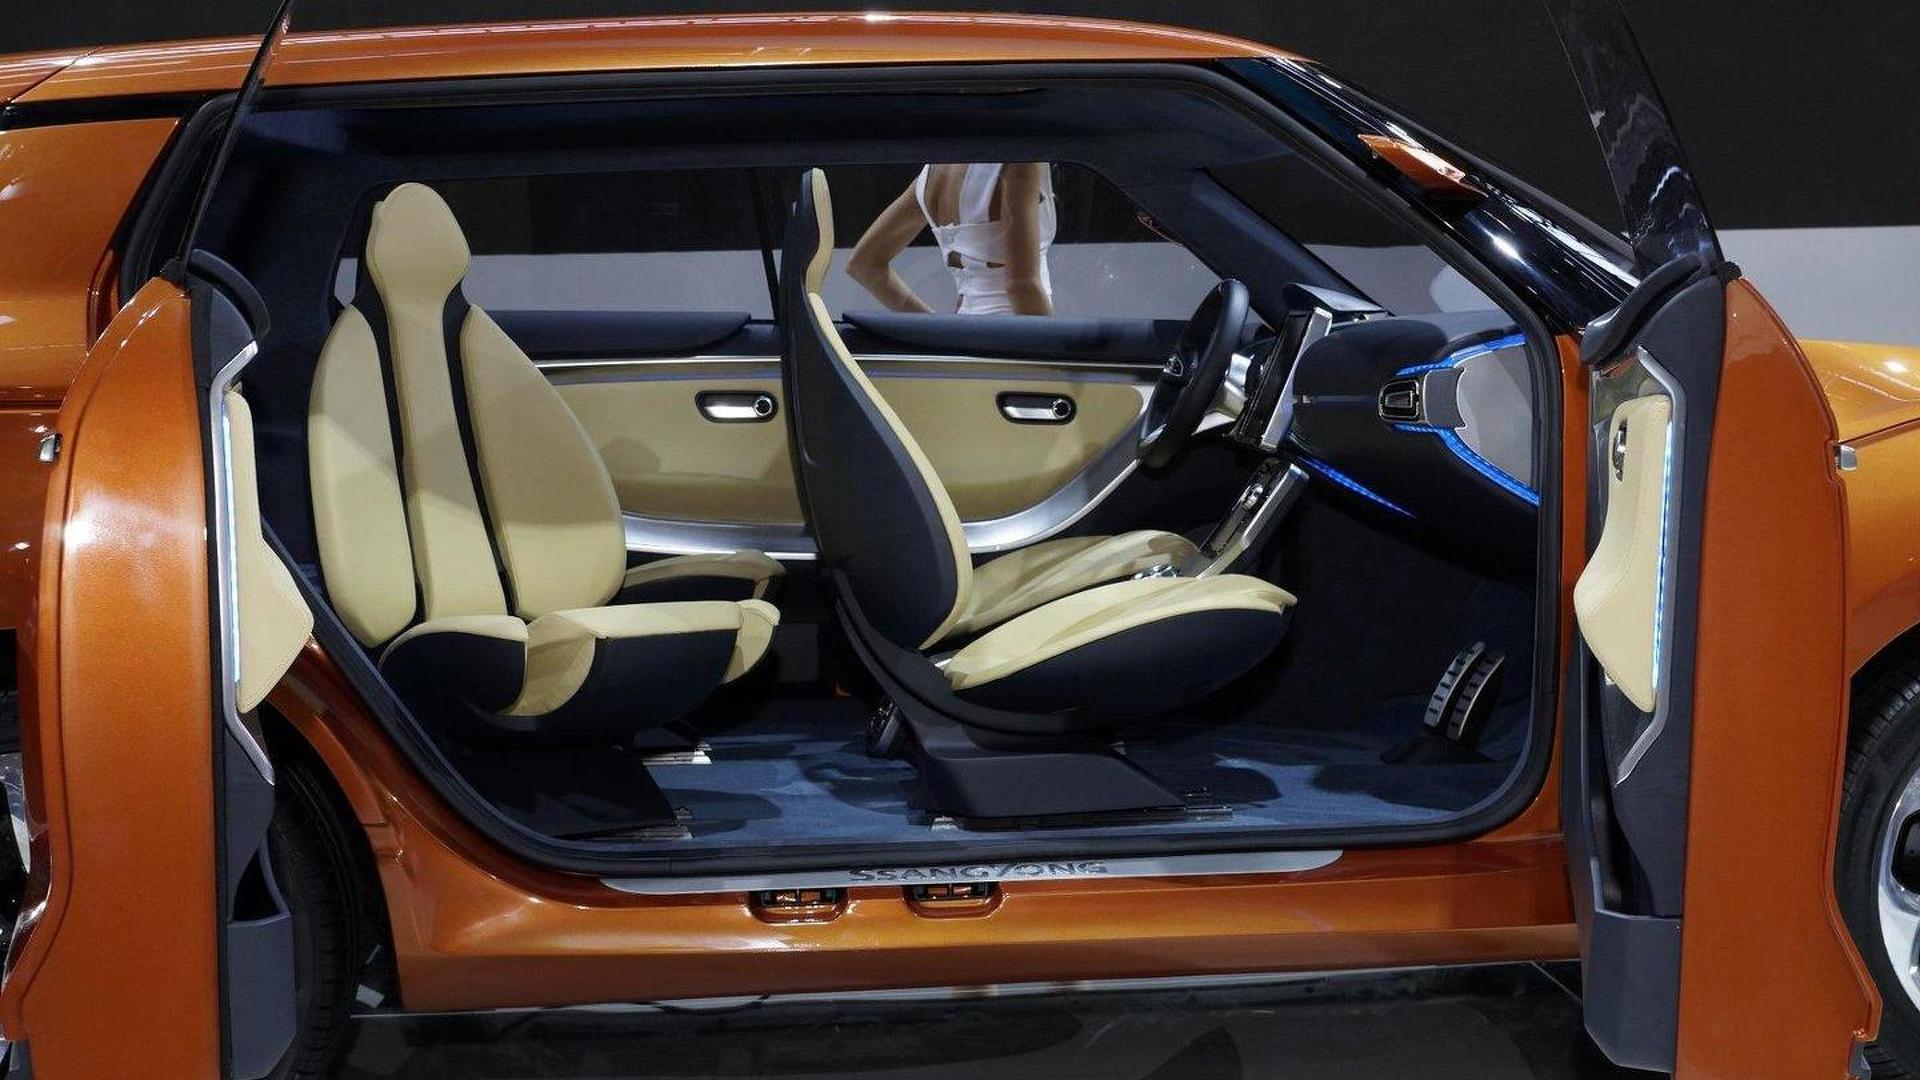 Ssangyong XIV-1 Concept debuts in Frankfurt